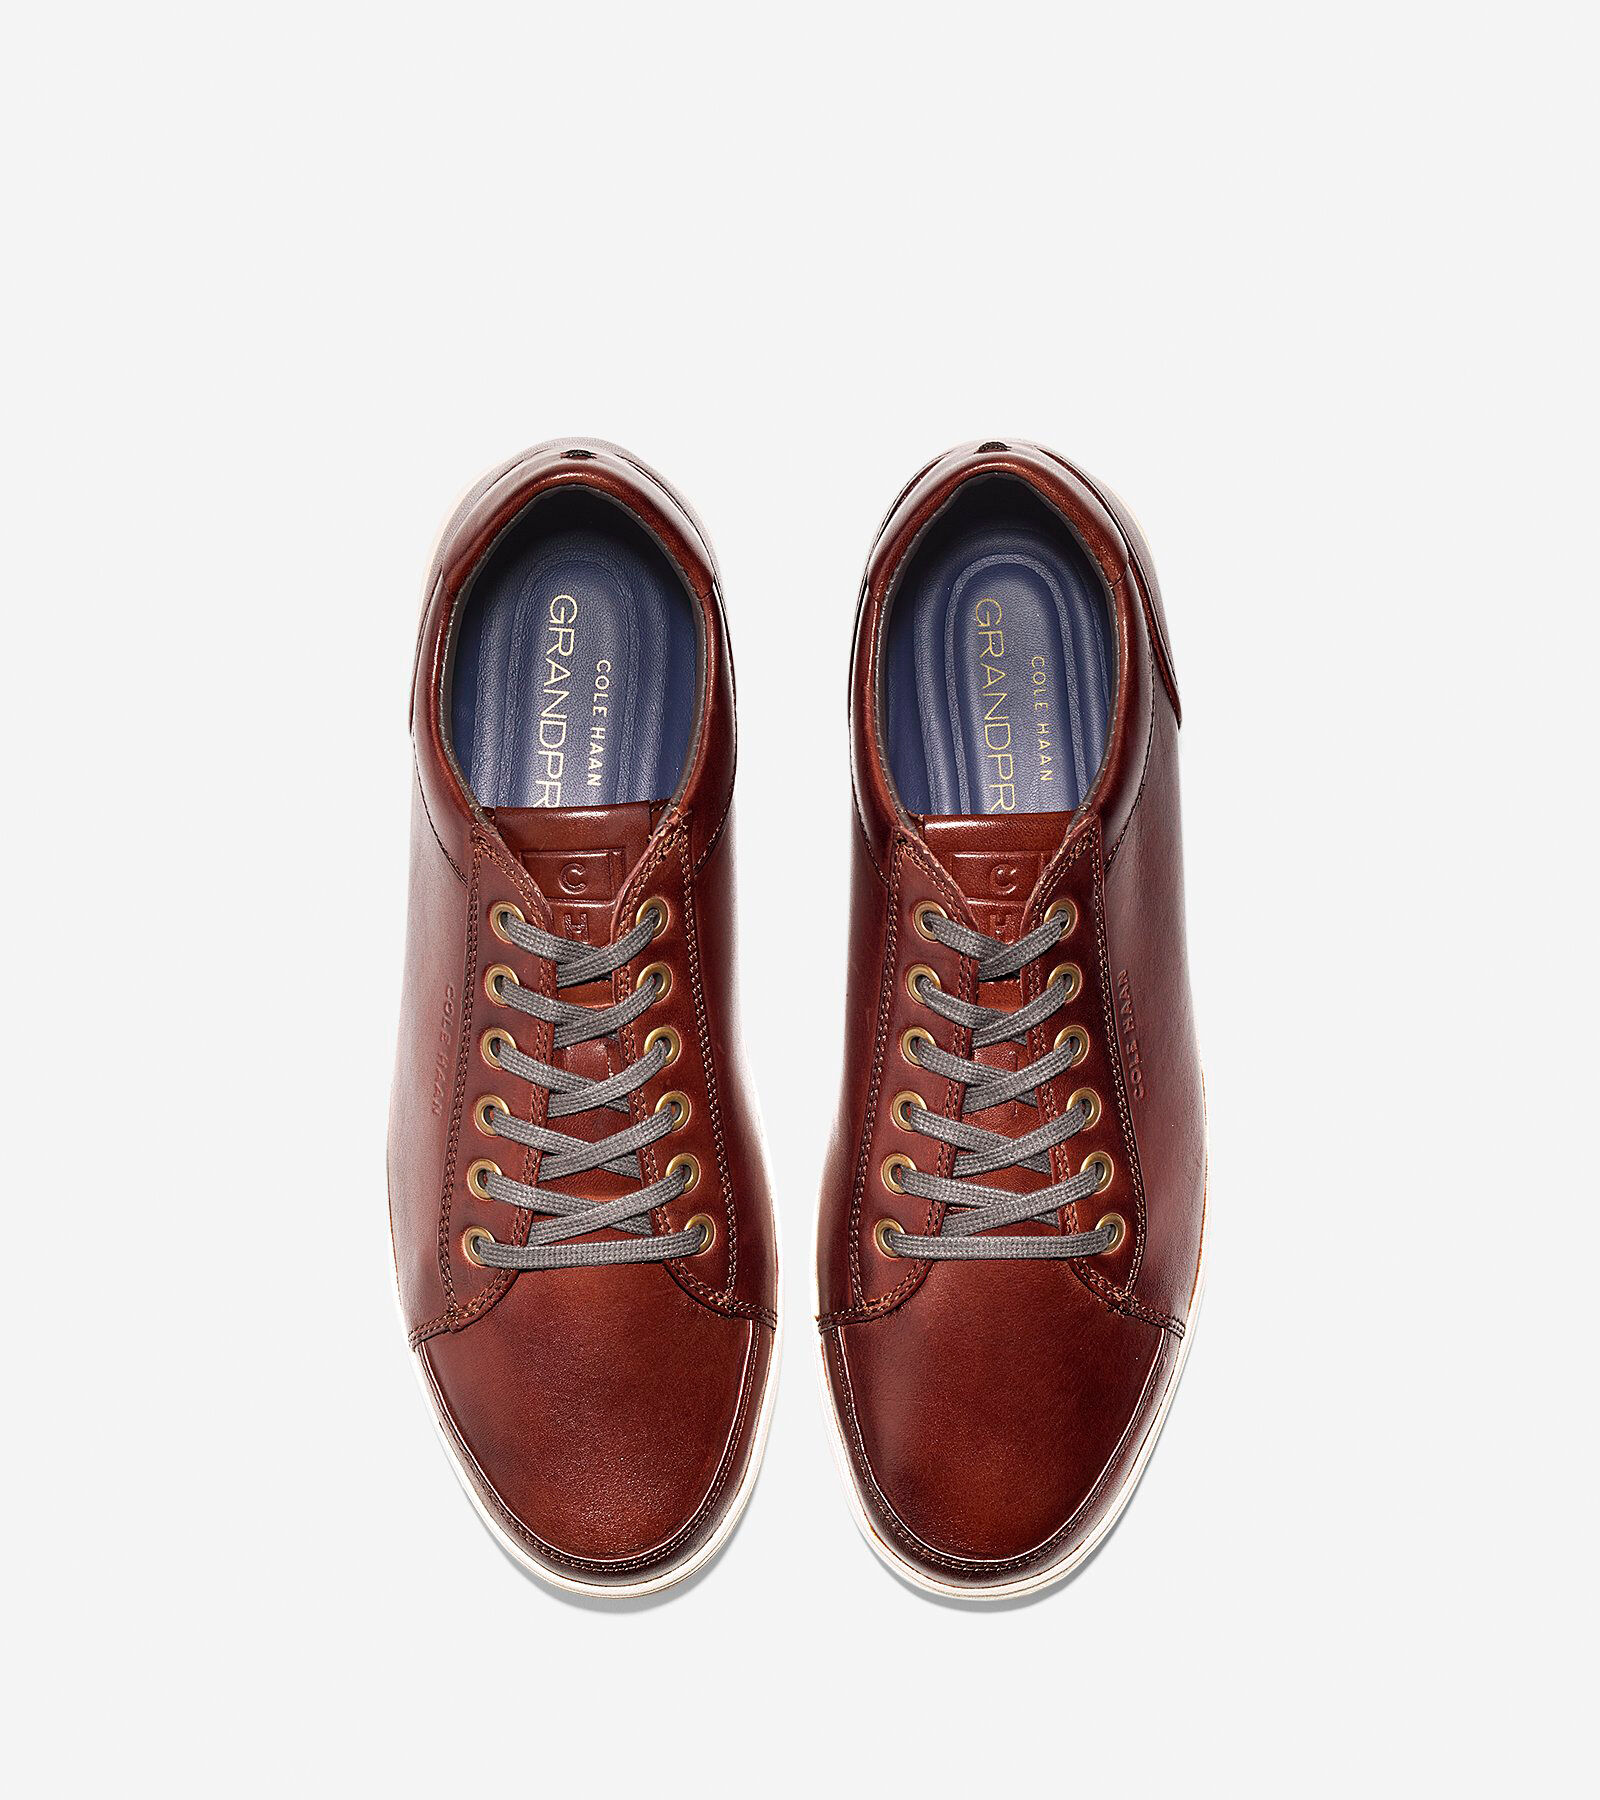 Spectator Sneaker in Woodbury Handstain